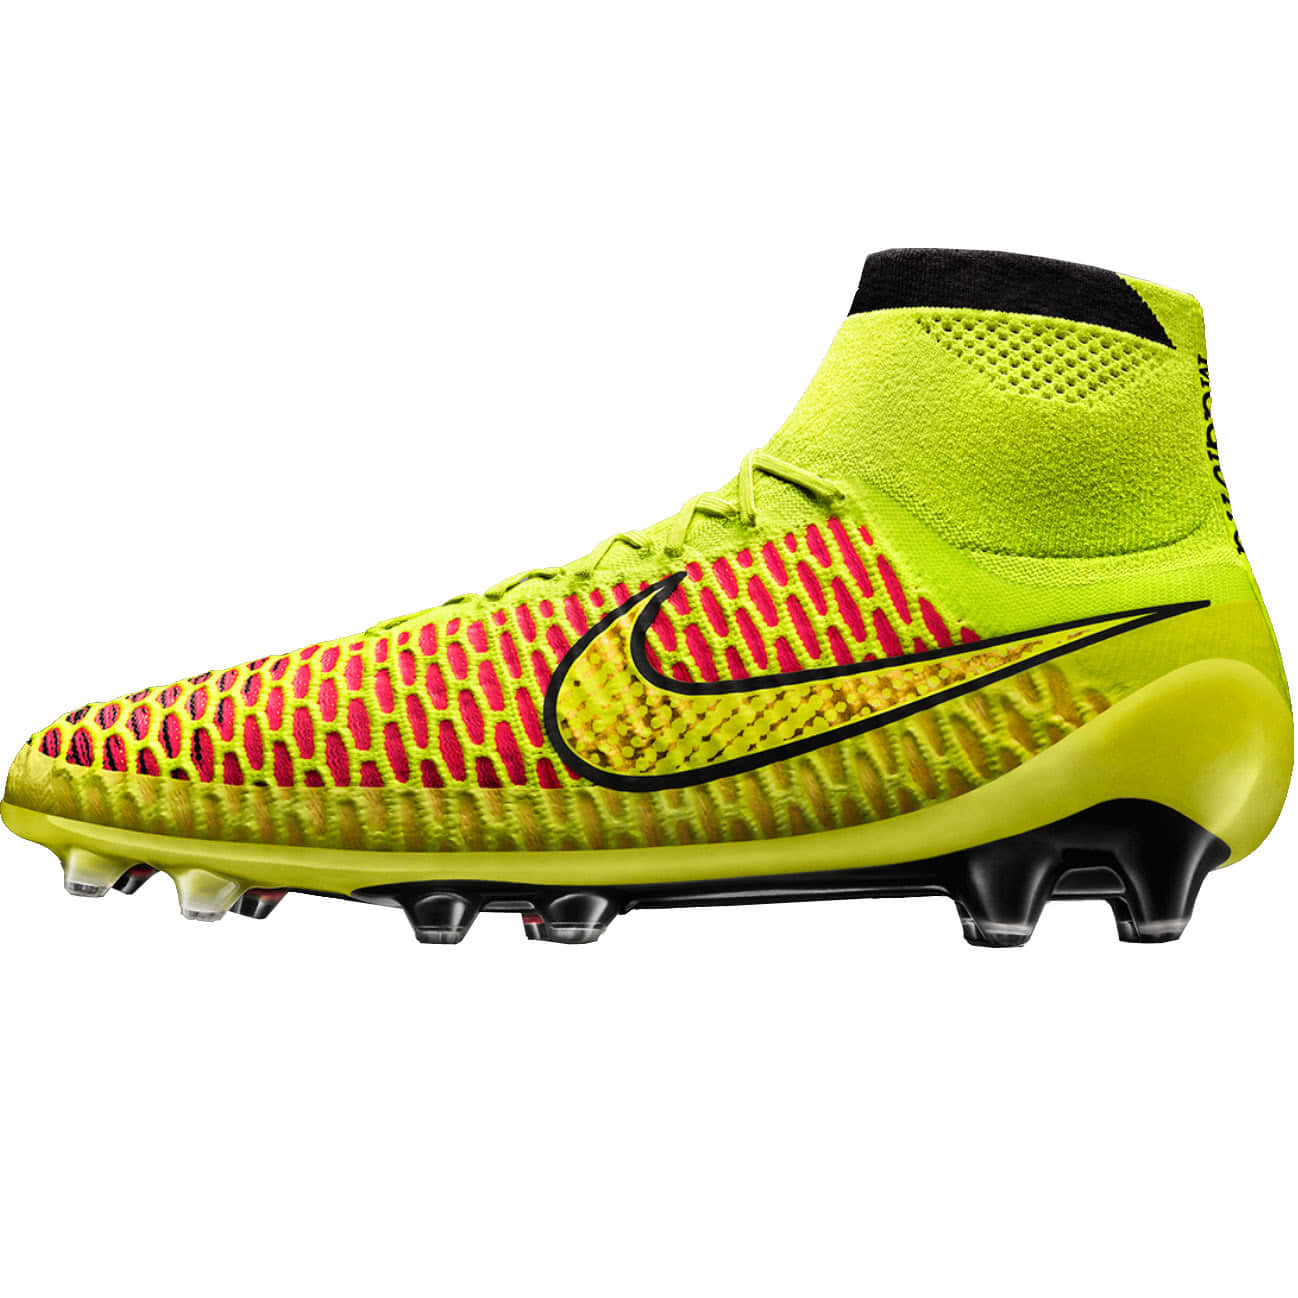 Nike Fußballschuhe Mit Socken Neu soulfly